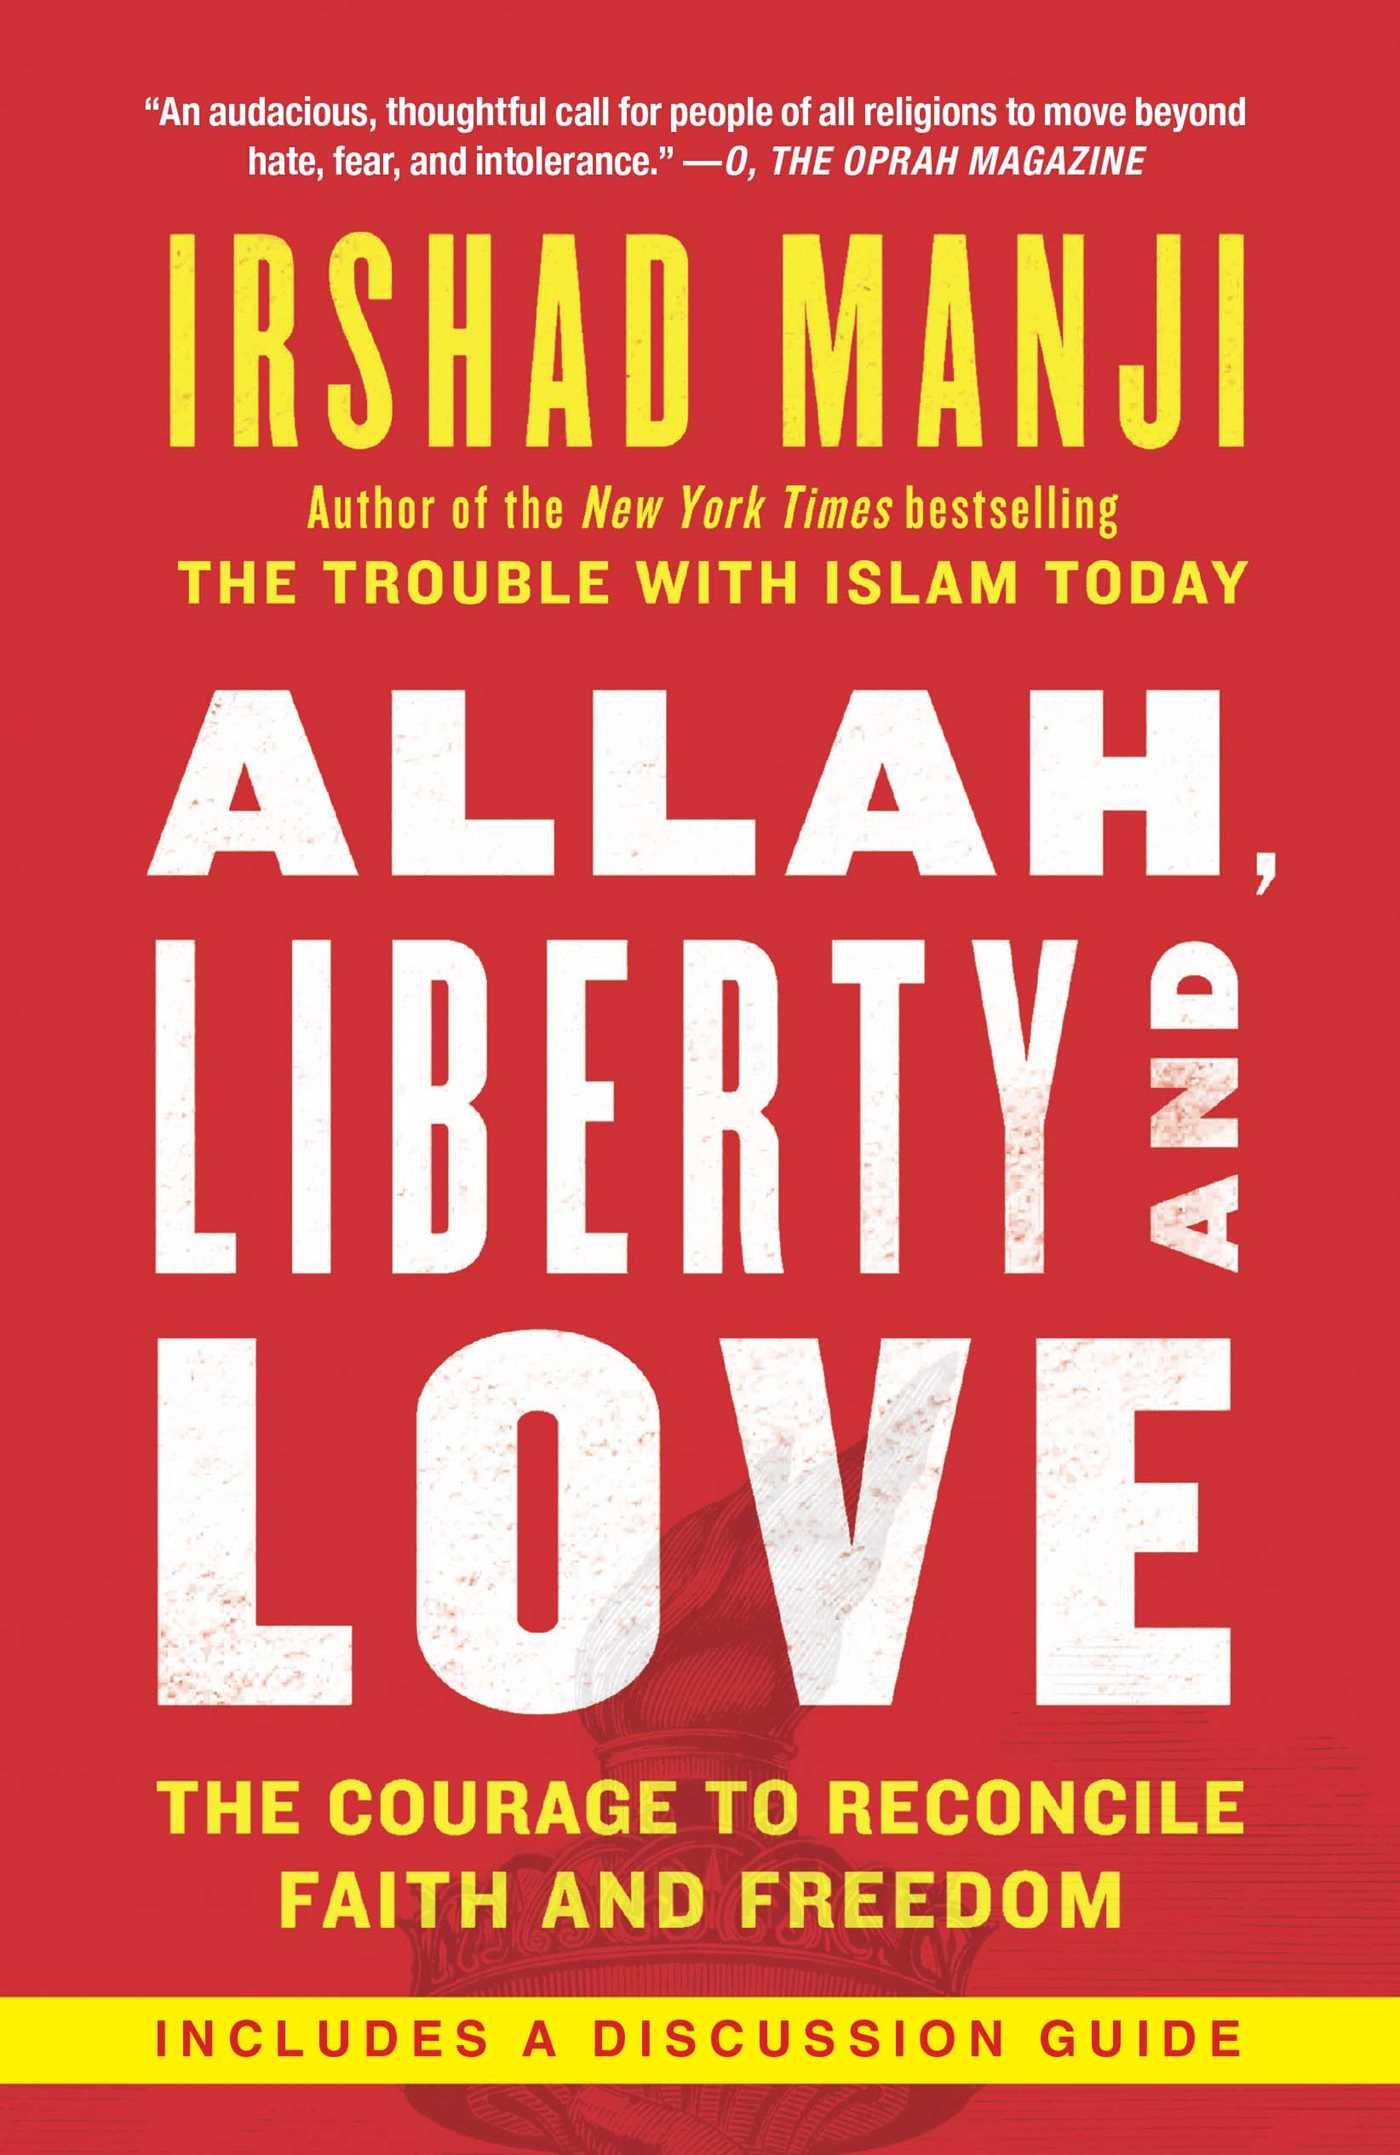 Allah liberty and love 9781451645224 hr